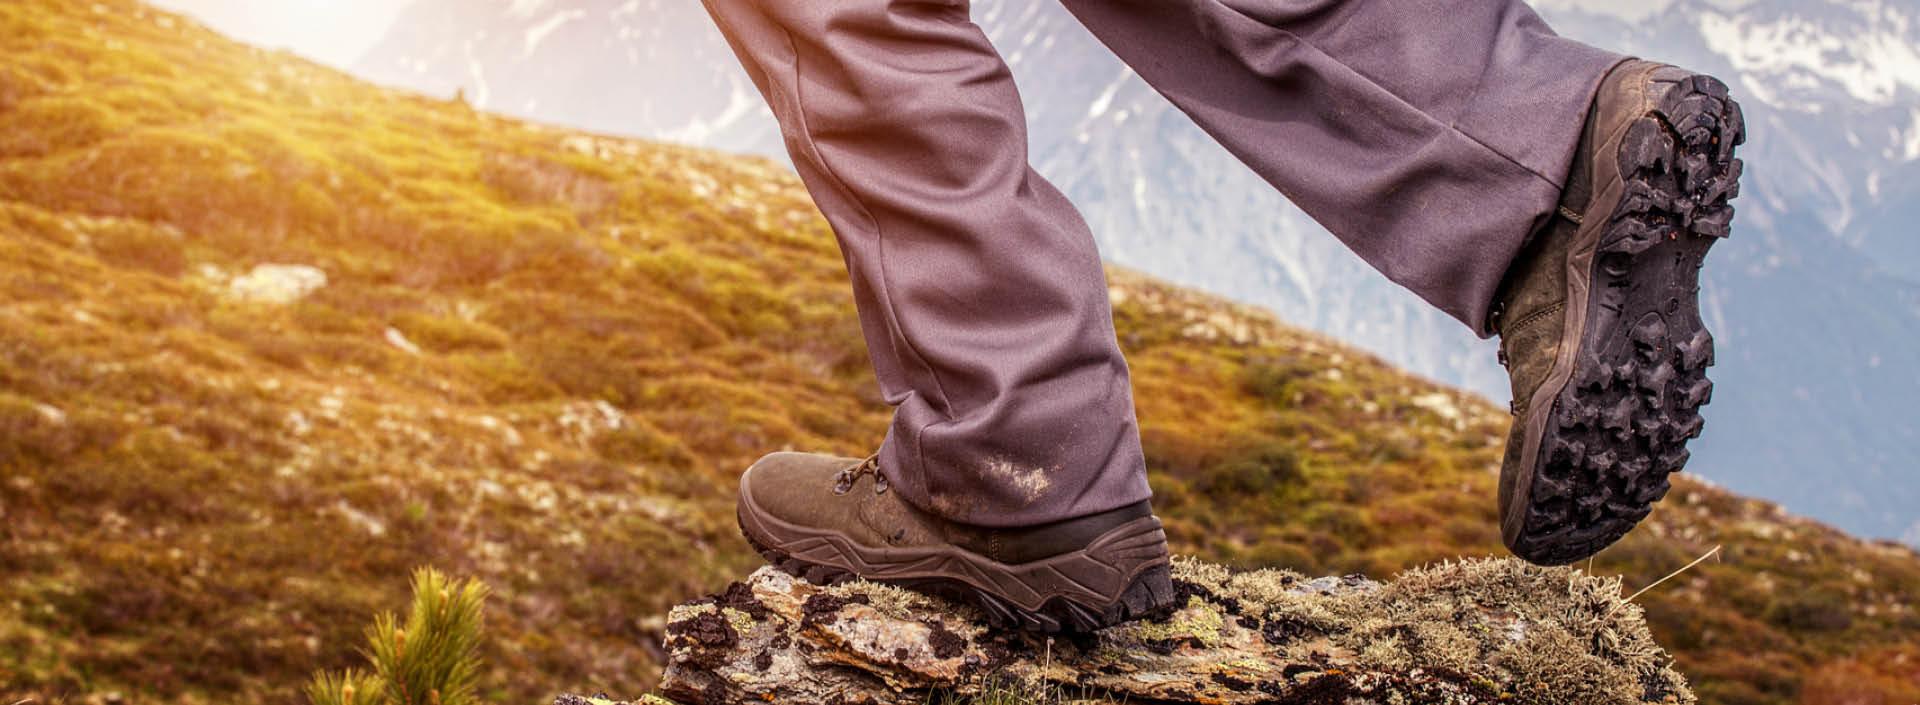 spodnie w góry